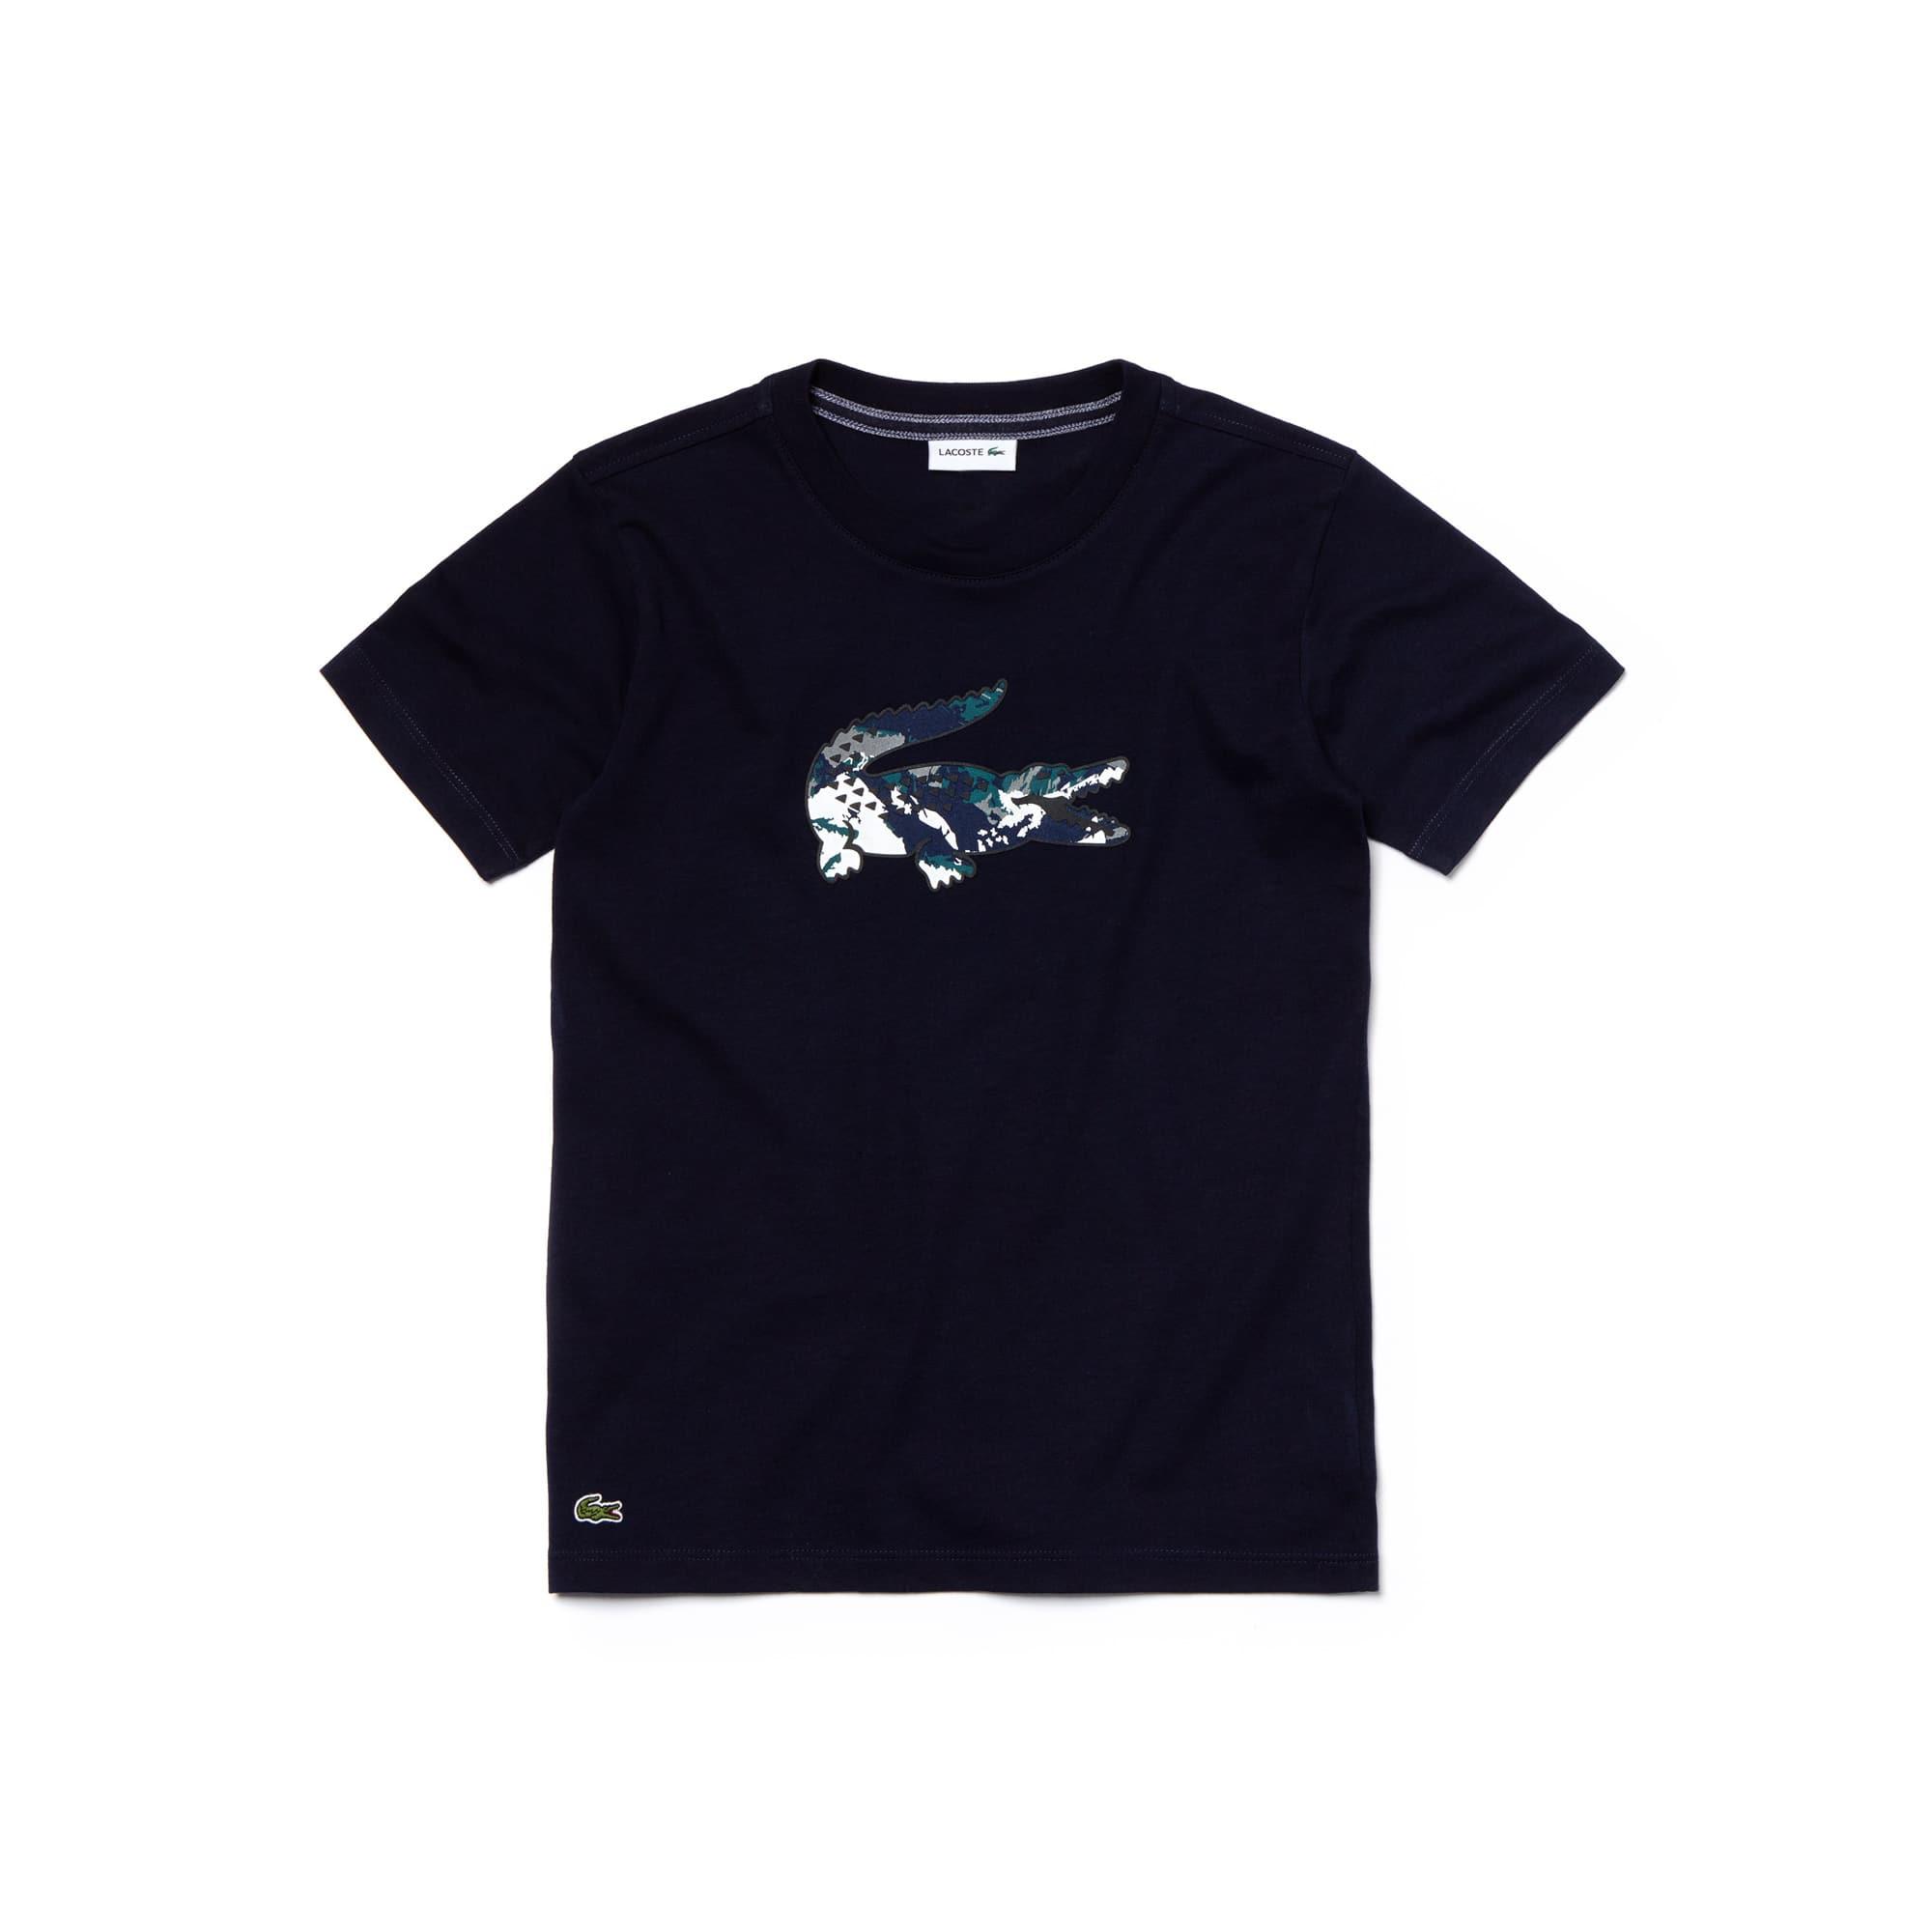 Boys' Oversized Crocodile Cotton Jersey T-shirt